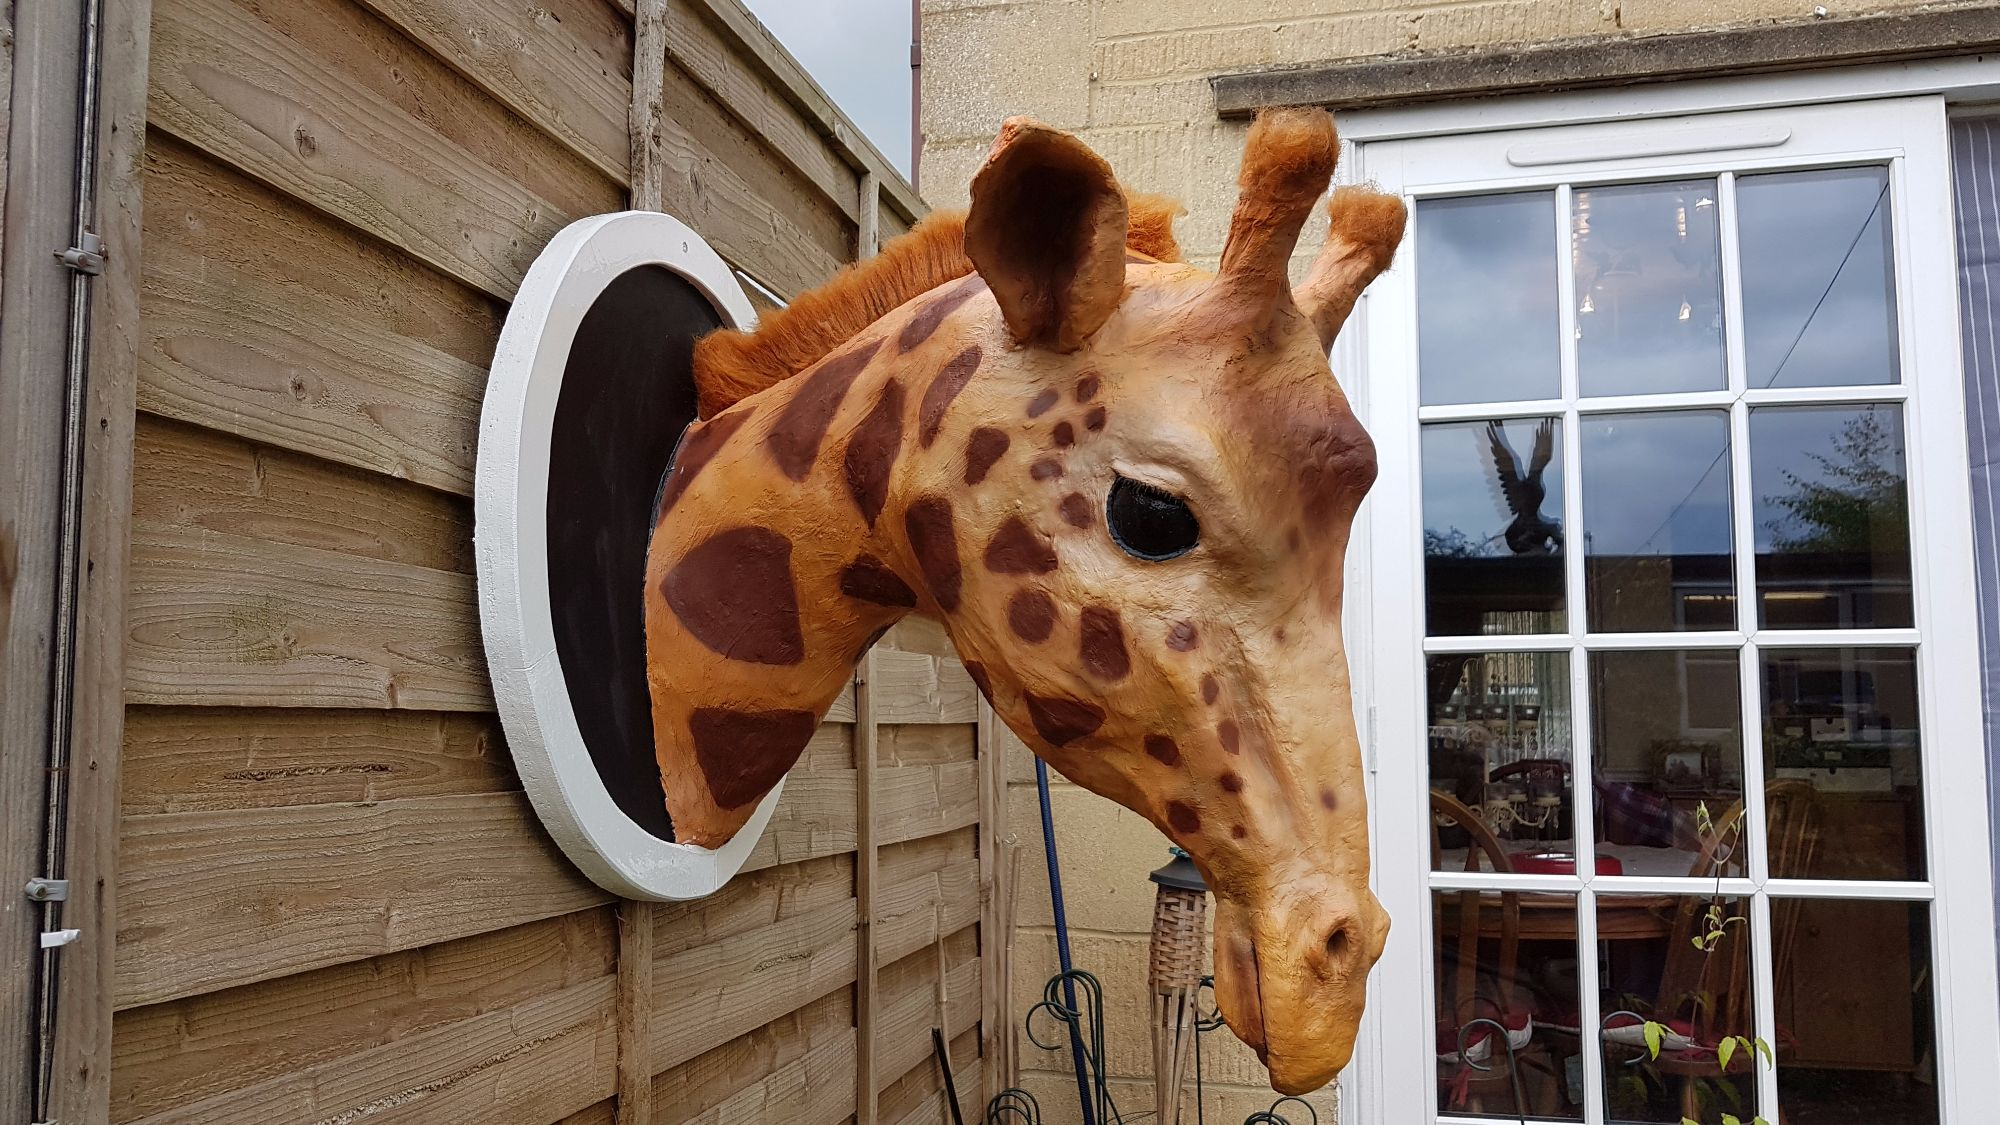 Giraffe chickenwire